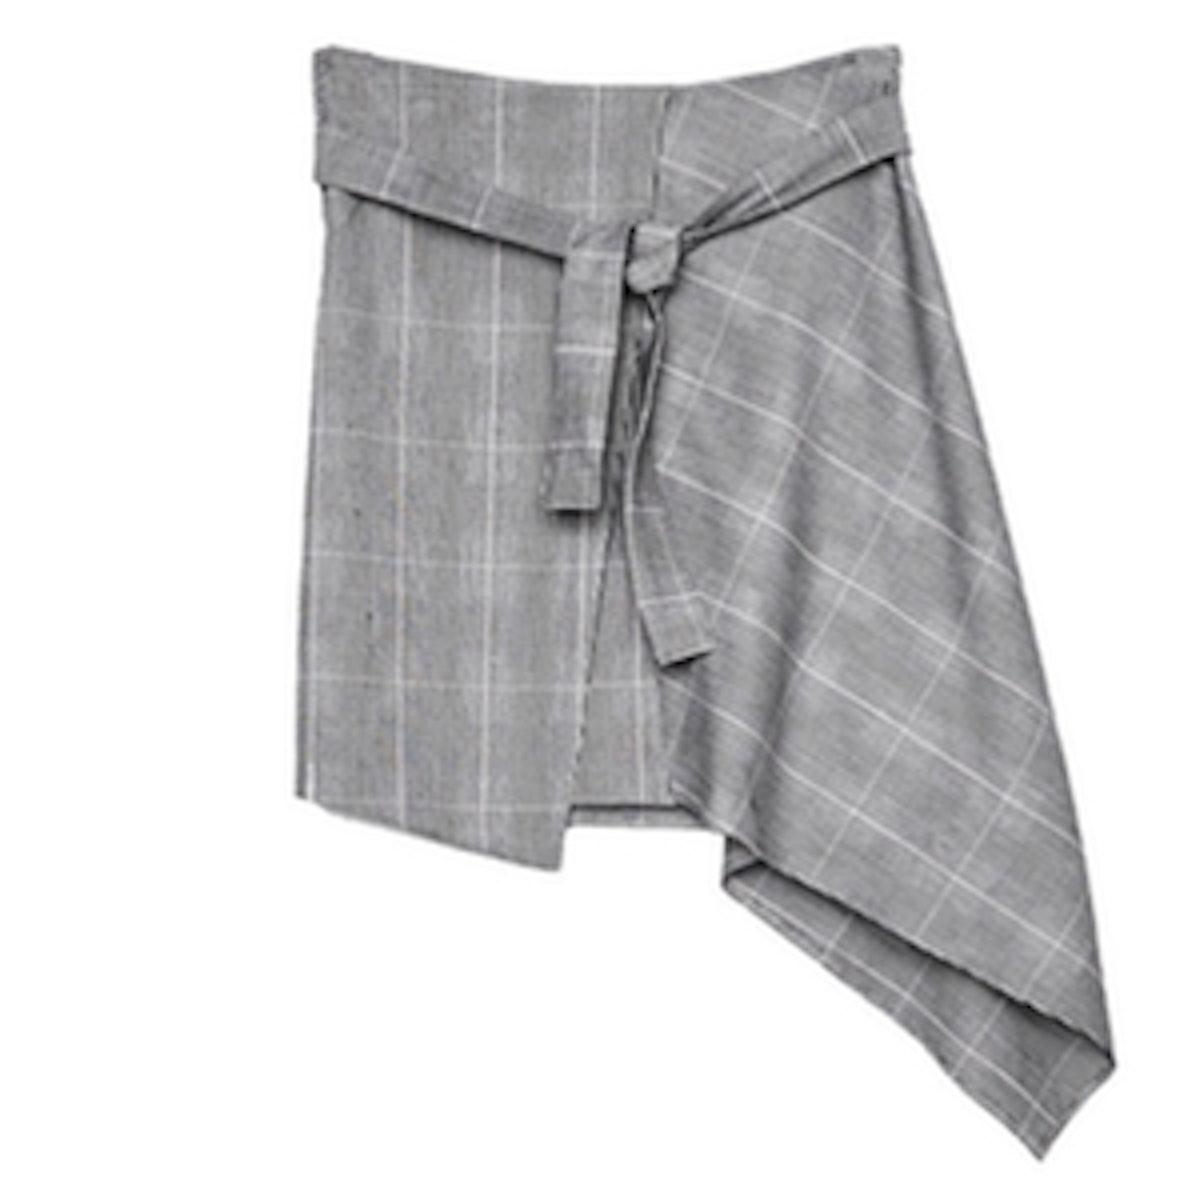 Asymmetric Skirt With Belt